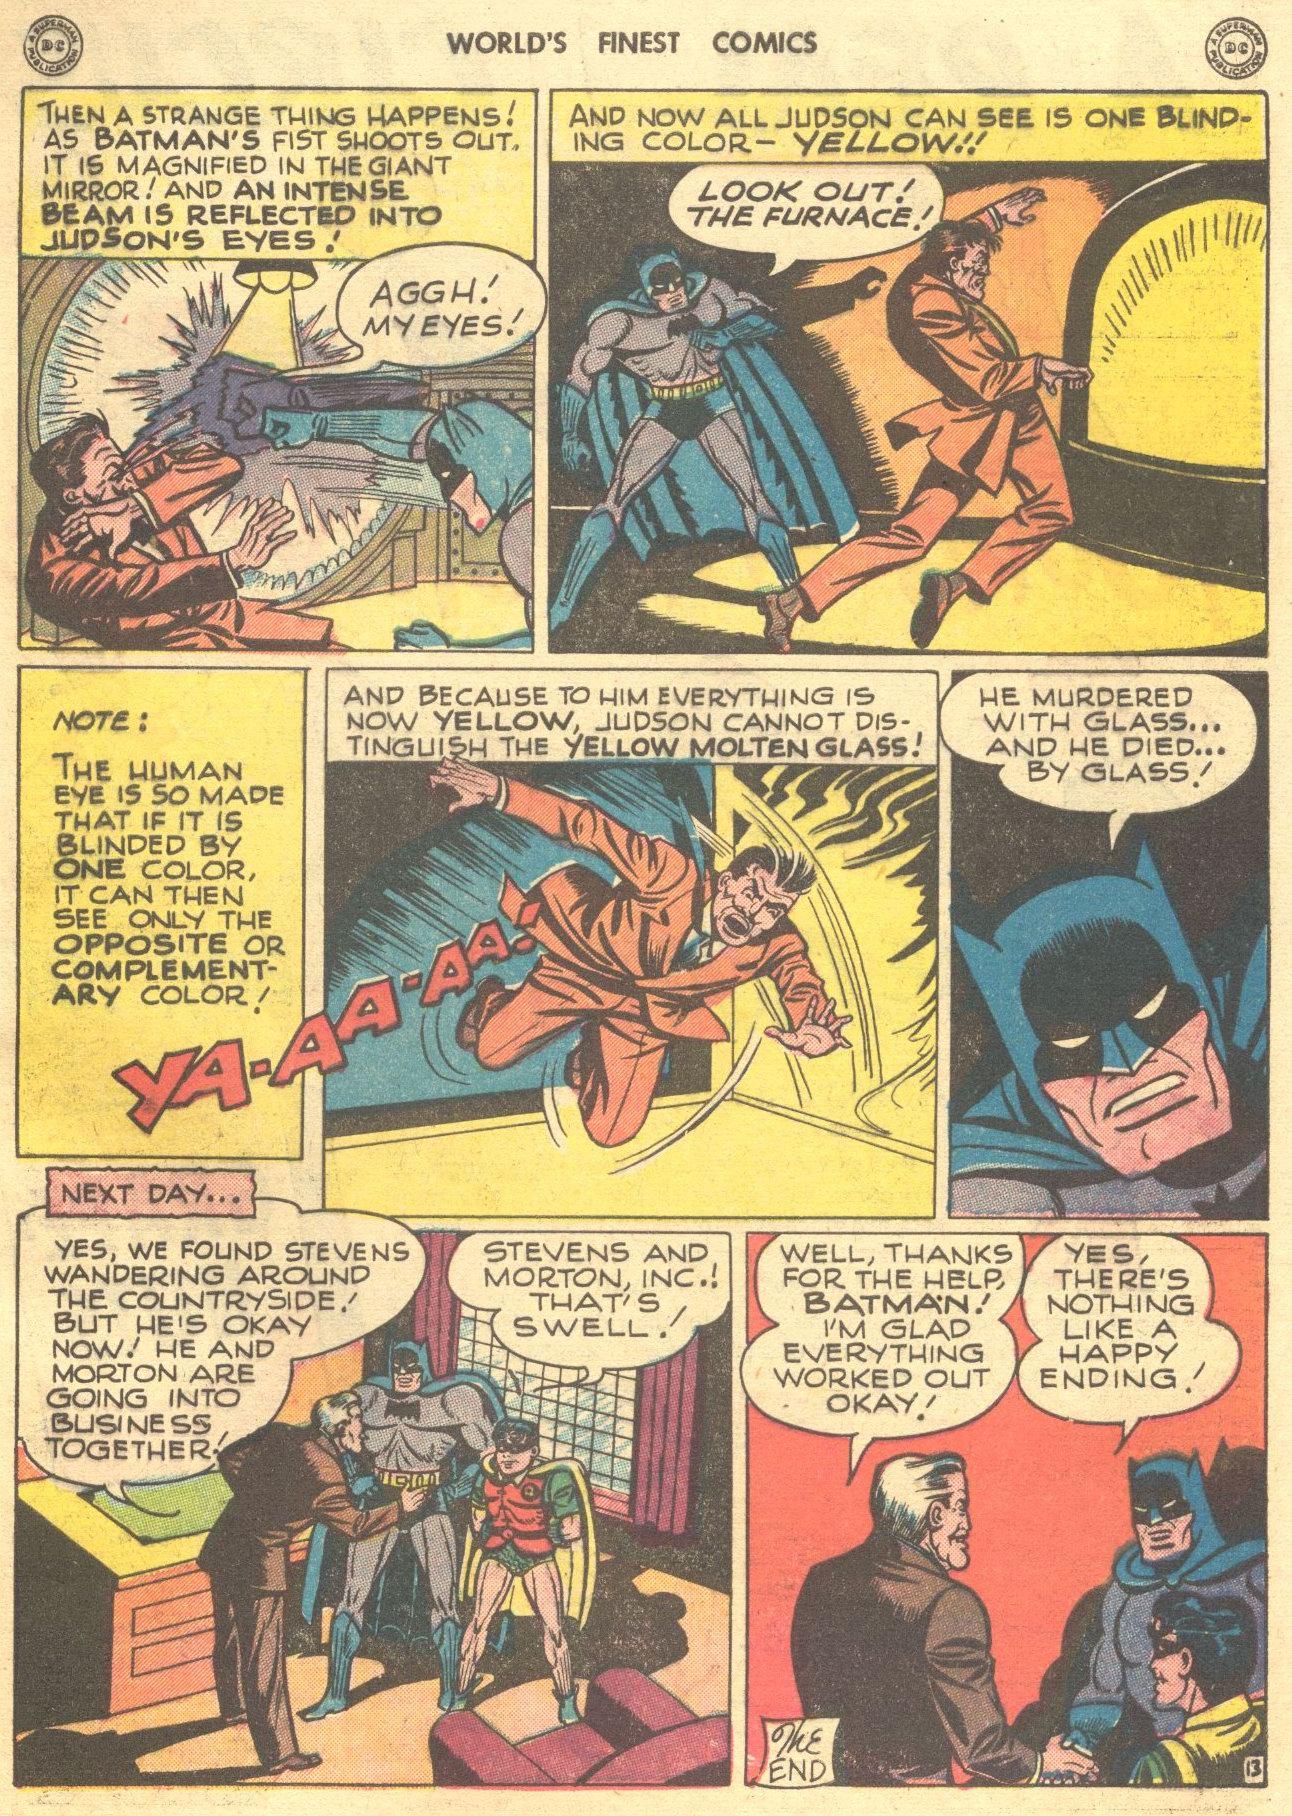 Read online World's Finest Comics comic -  Issue #28 - 72